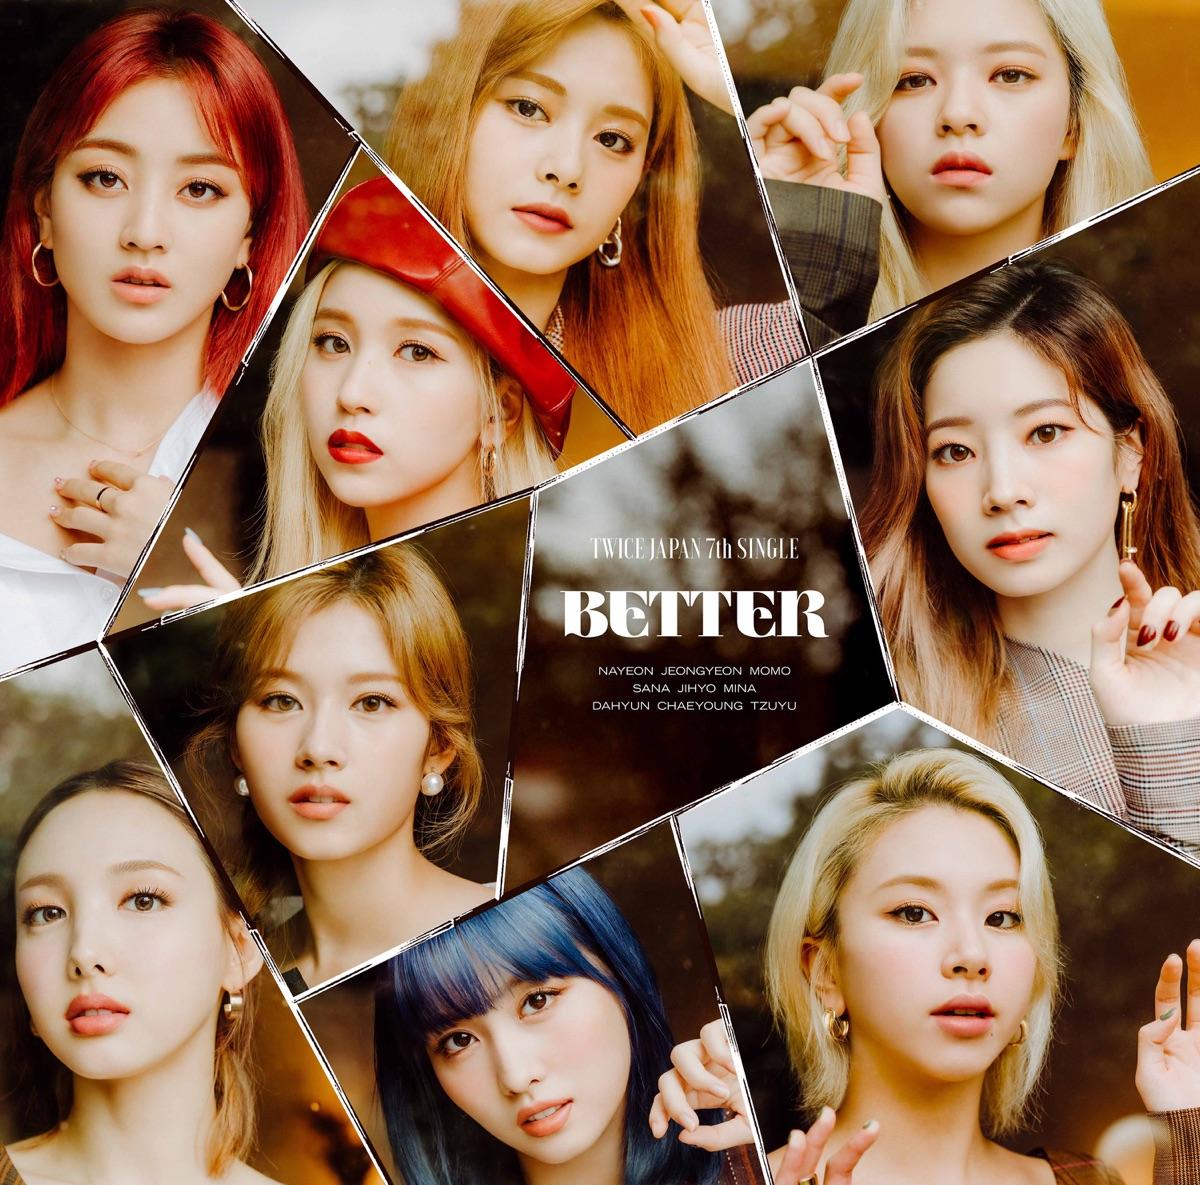 『TWICE BETTER 歌詞』収録の『BETTER』ジャケット